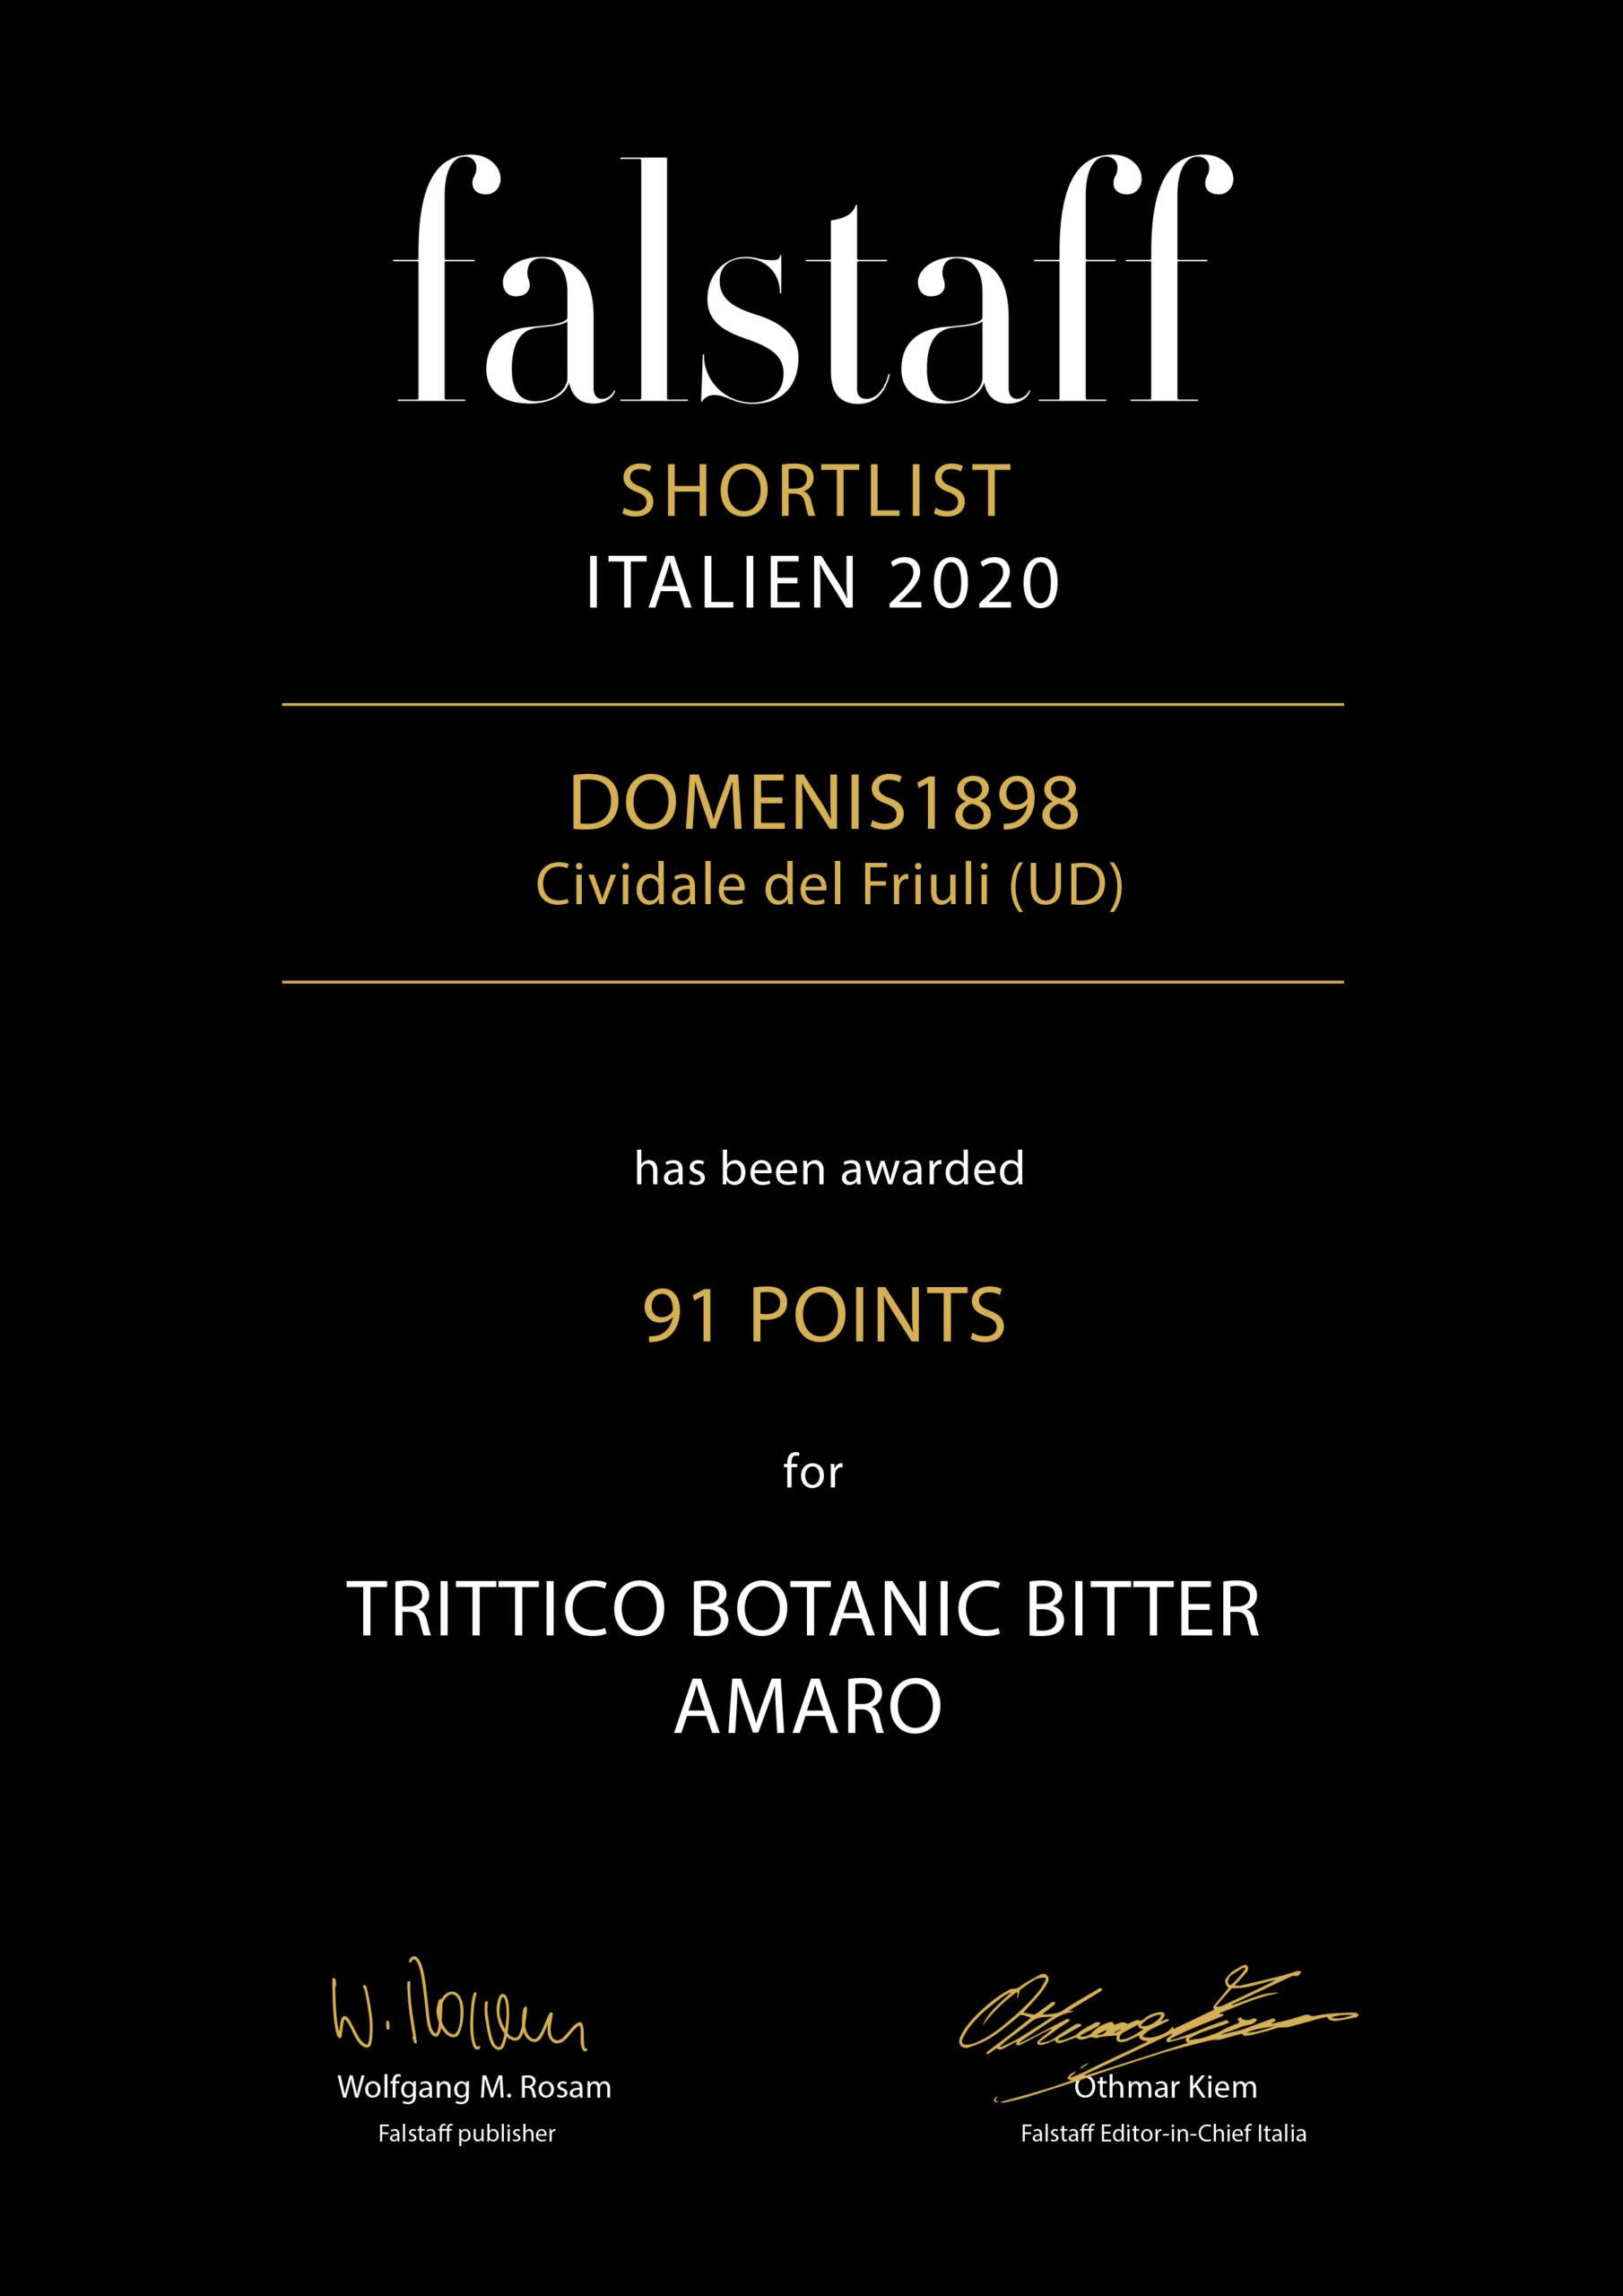 Falstaff Shortlist Italien 2020 – Trittico Botanic bitter